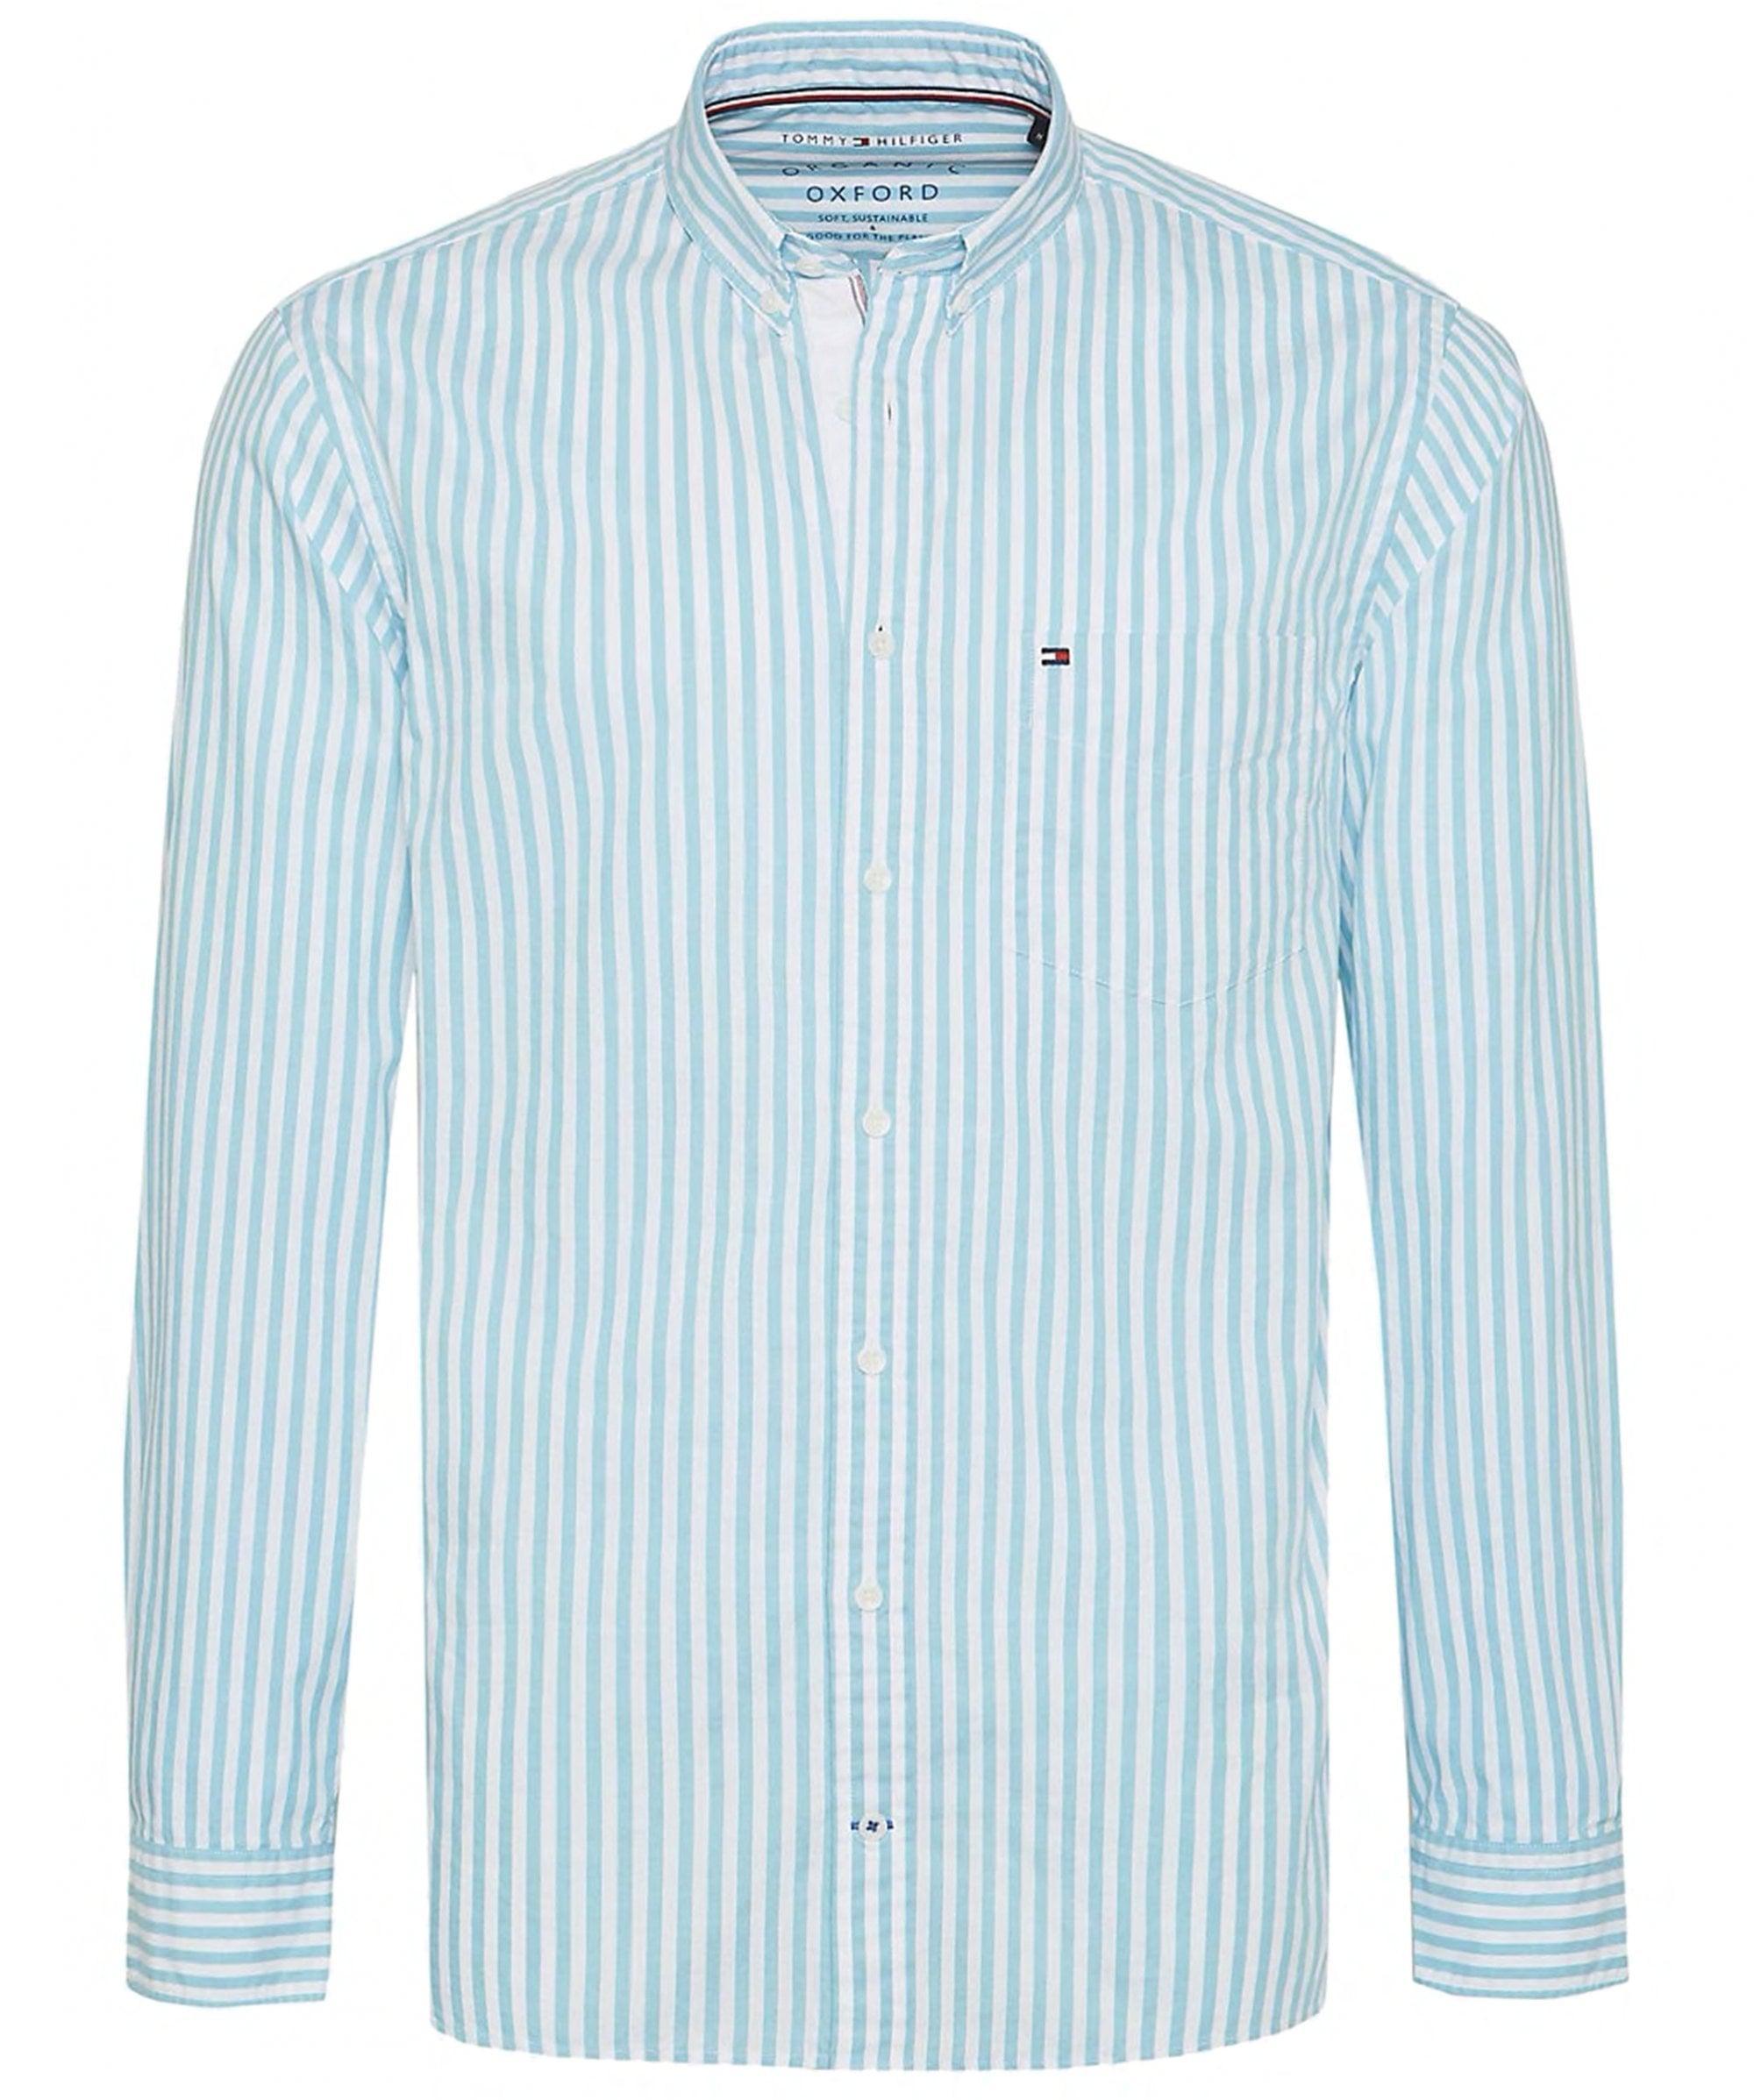 2df0e3cdb Tommy Hilfiger - Blue Regular Fit Striped Oxford Shirt for Men - Lyst. View  fullscreen